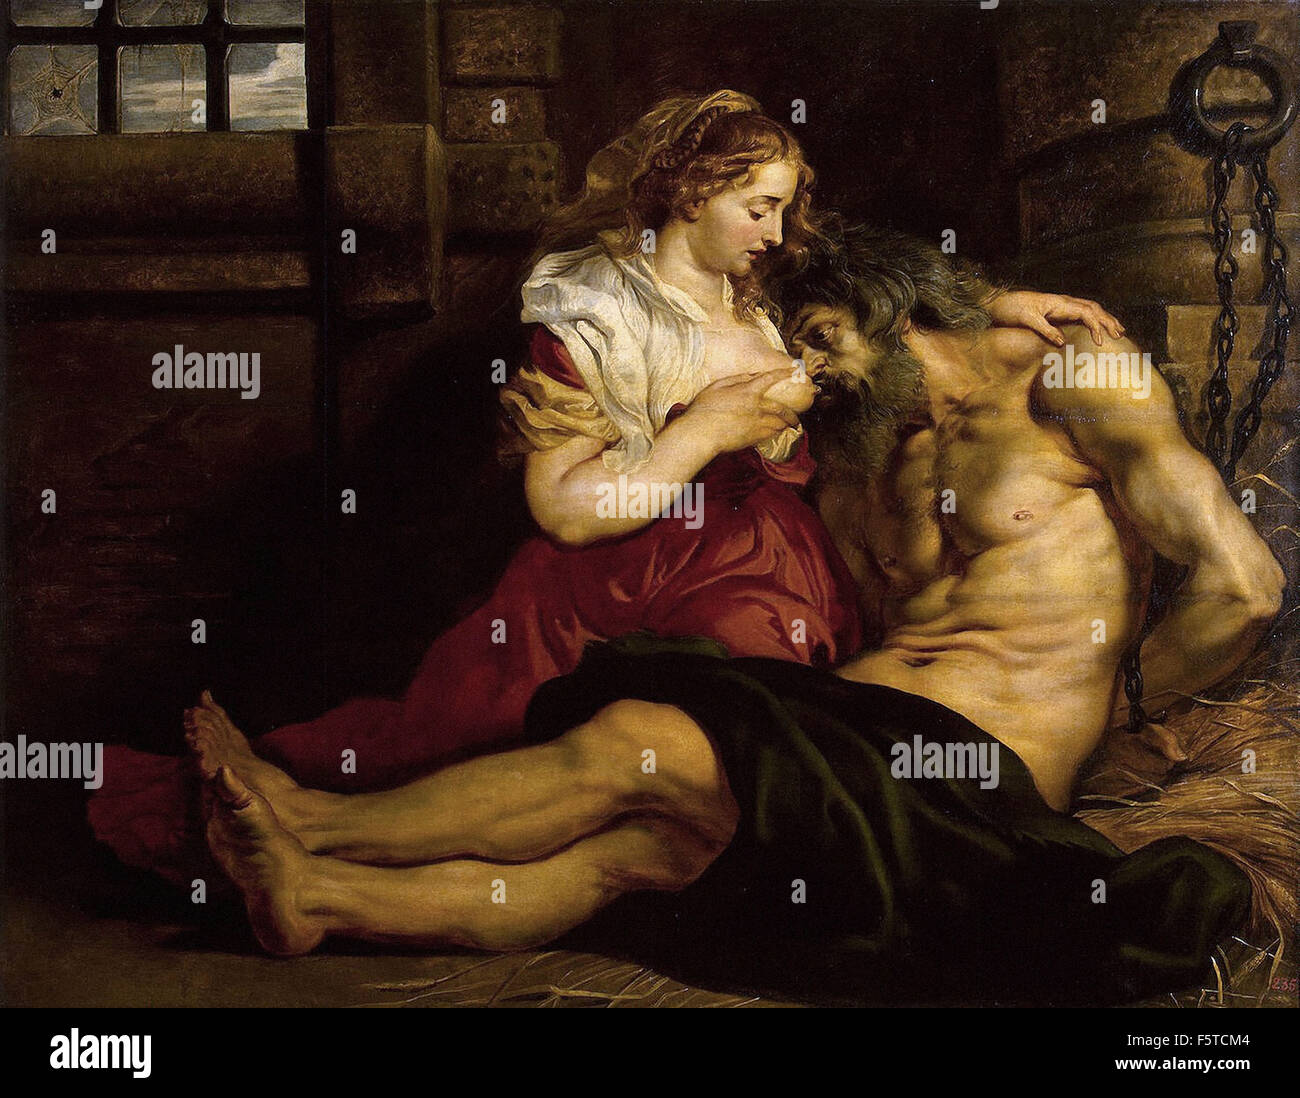 Peter Paul Rubens - Charité Romaine Photo Stock